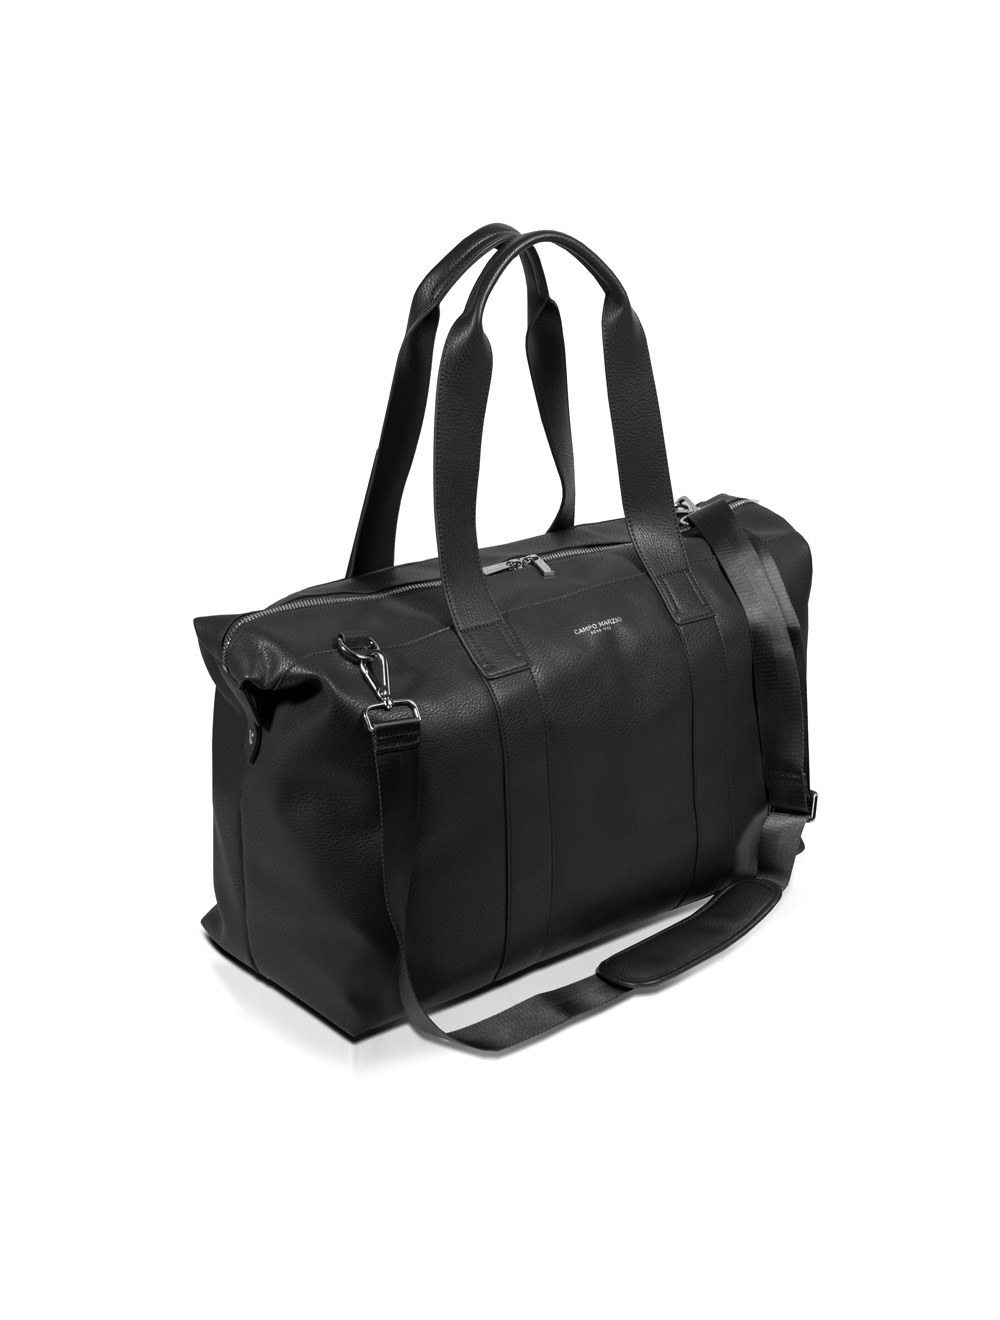 Travel Bag Roald - Black